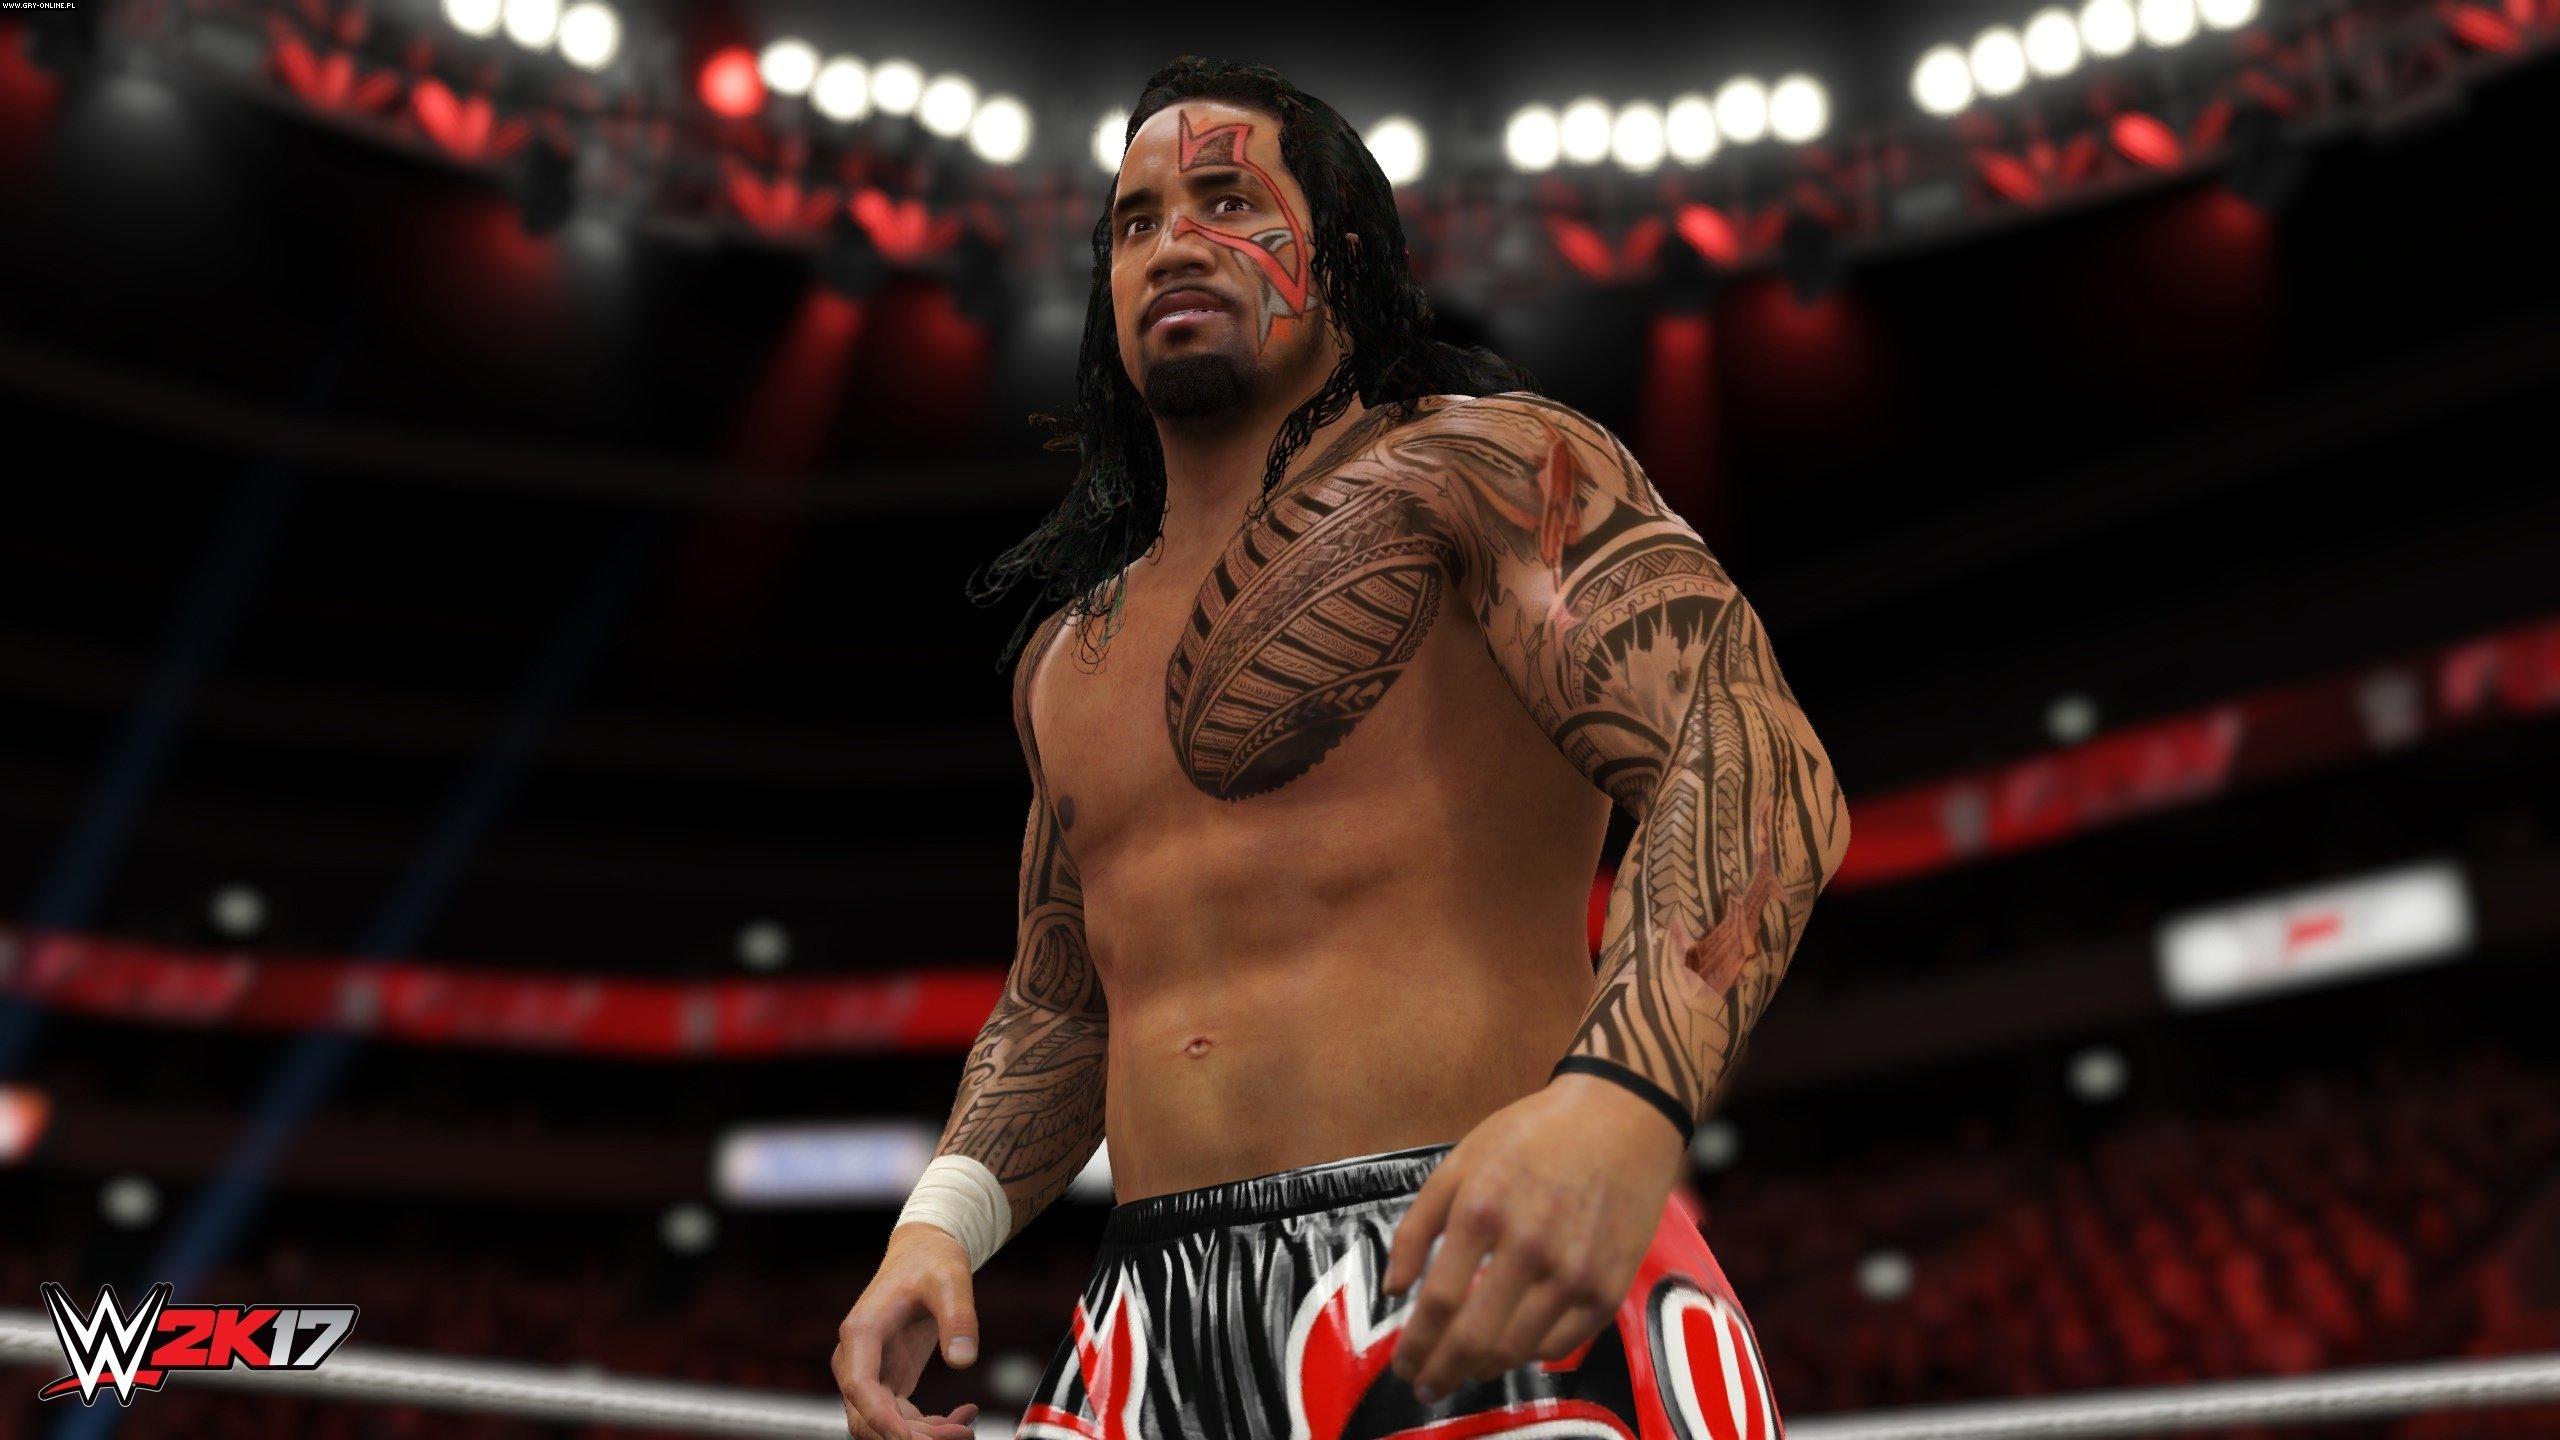 WWE 2K17 PS4, XONE, X360, PS3 Games Image 46/46, Yuke's, 2K Games